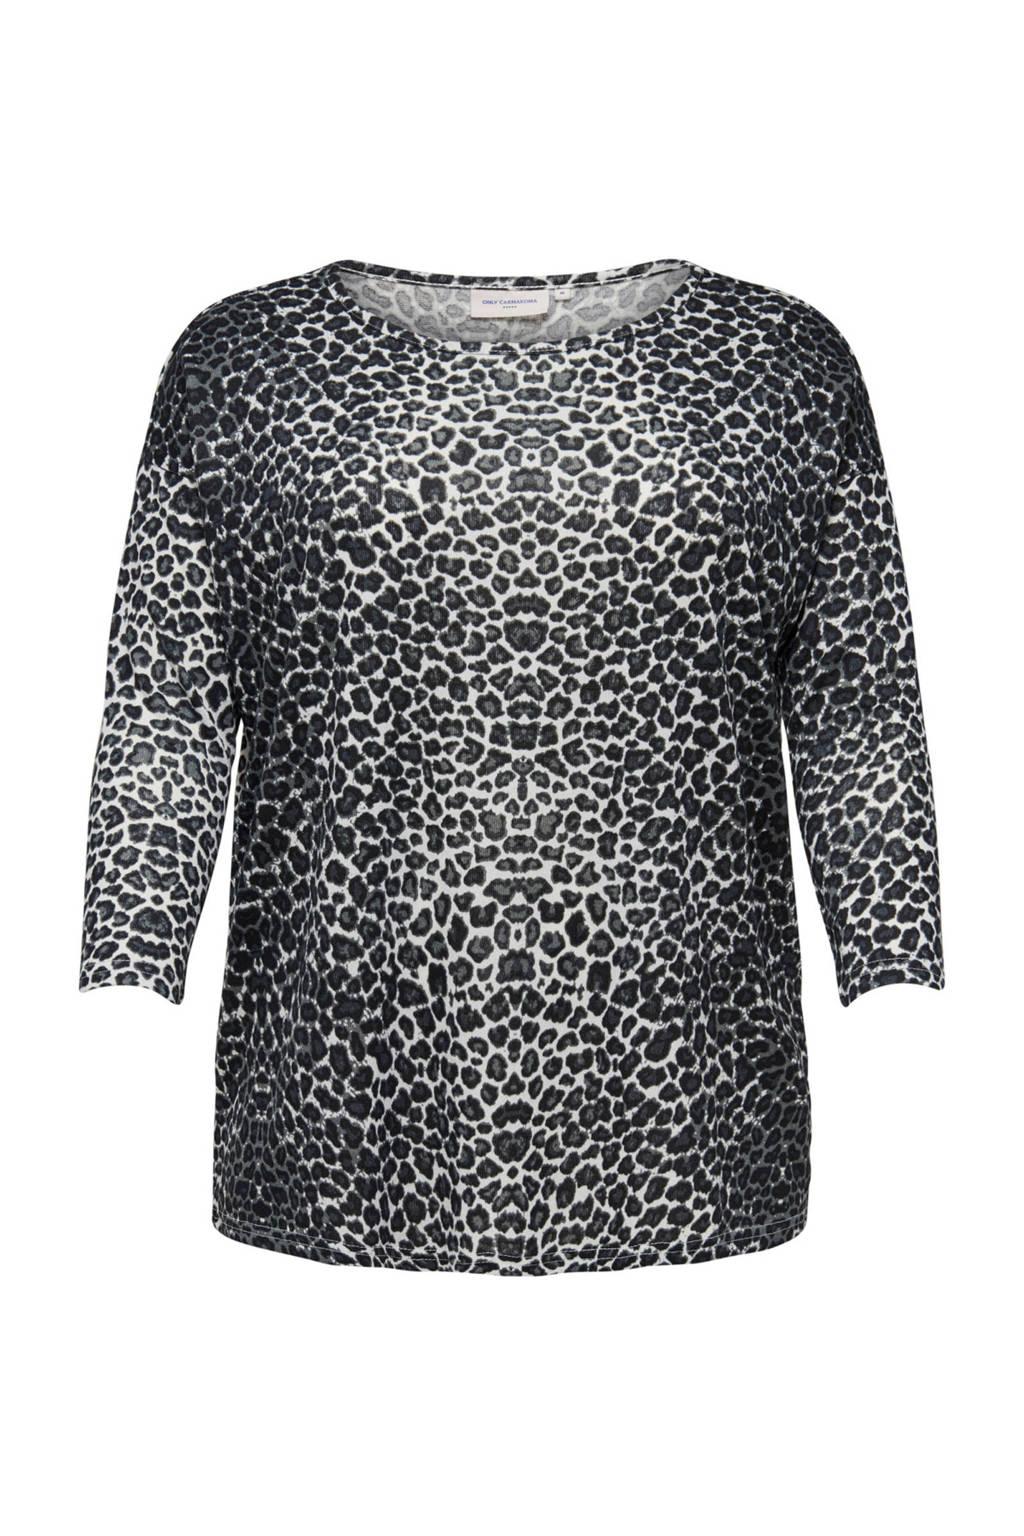 ONLY carmakoma T-shirt met panterprint, Grijs/wit/zwart